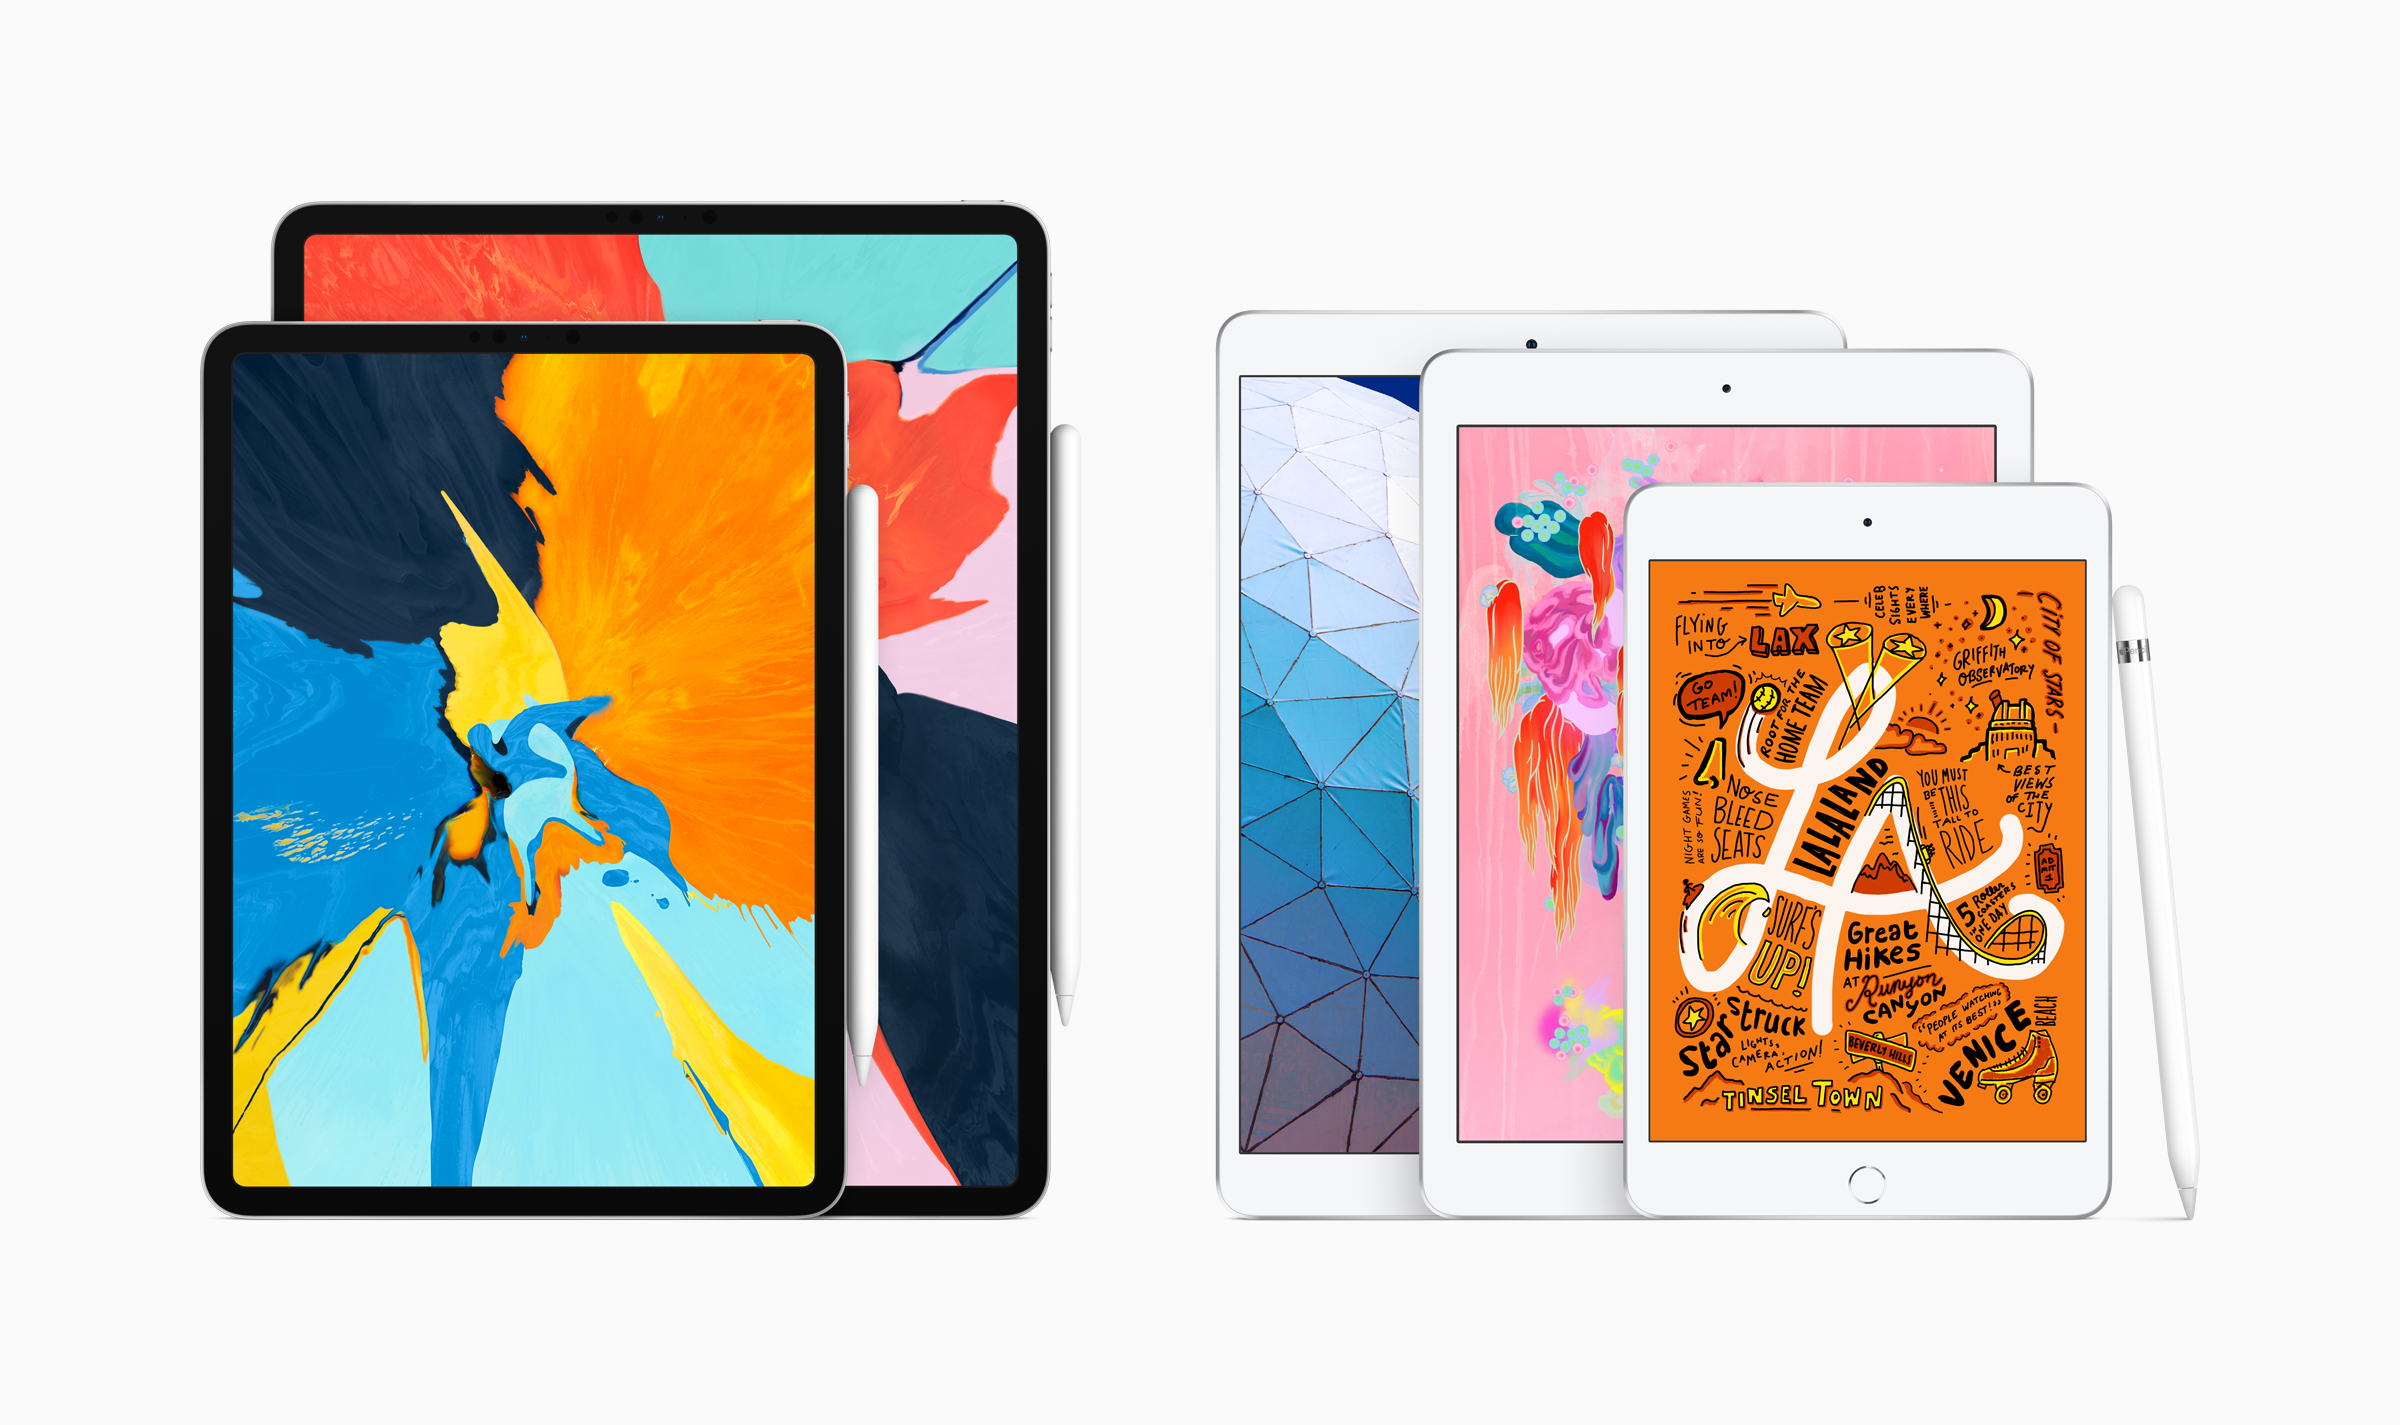 New-iPad-air-and-iPad-mini-with-Apple-Pencil-03182019.jpg